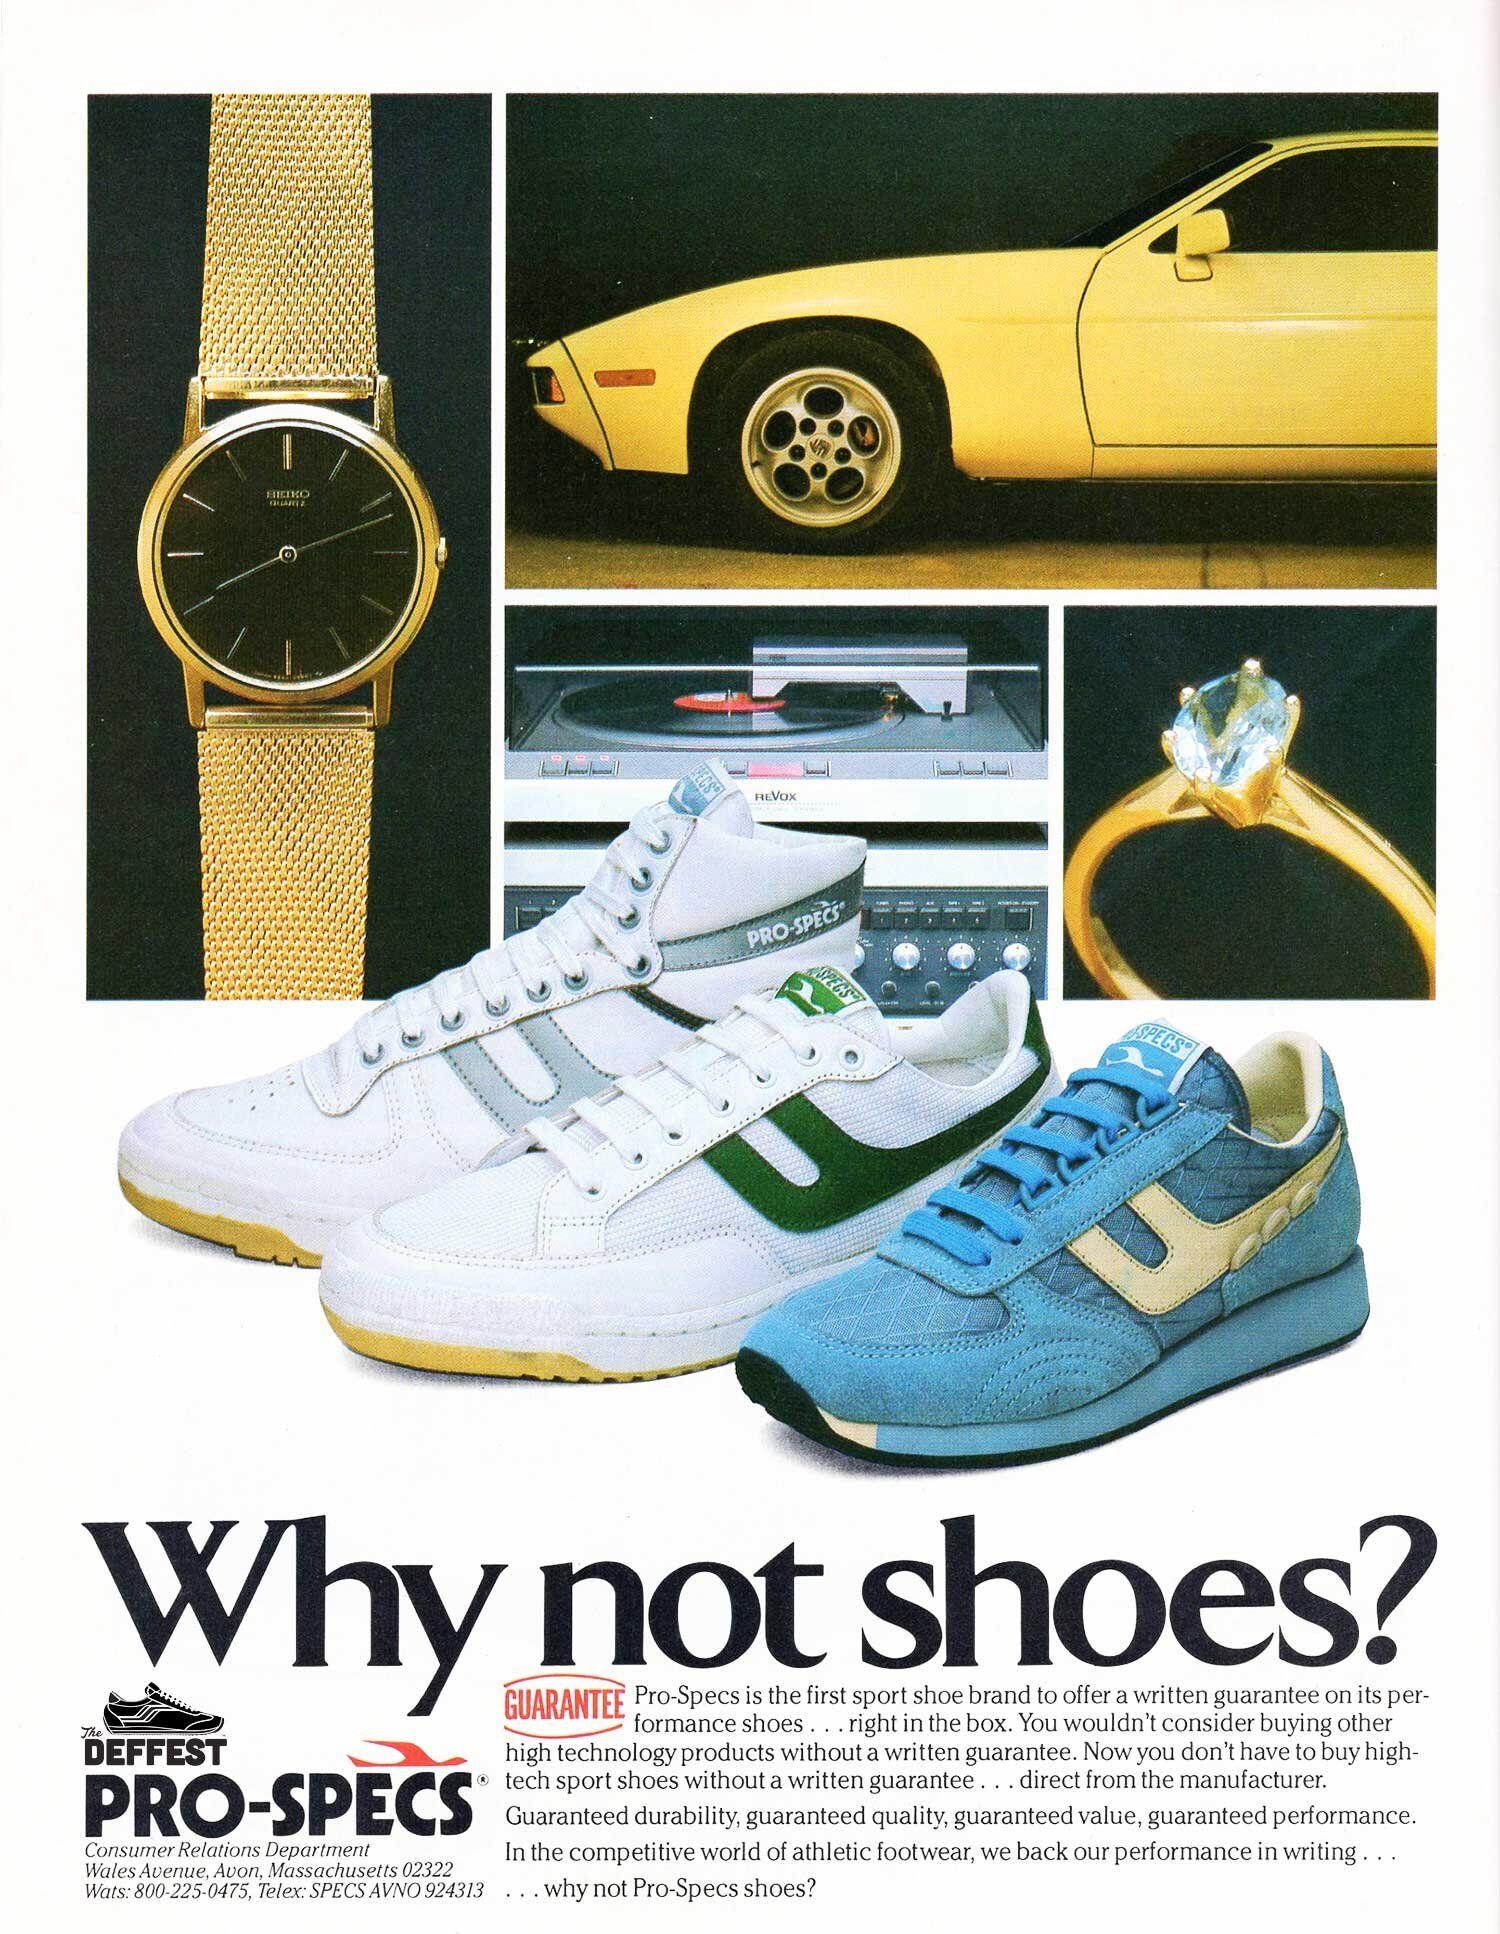 ProSpecs 1983 vintage sneaker ad The Deffest Vintage